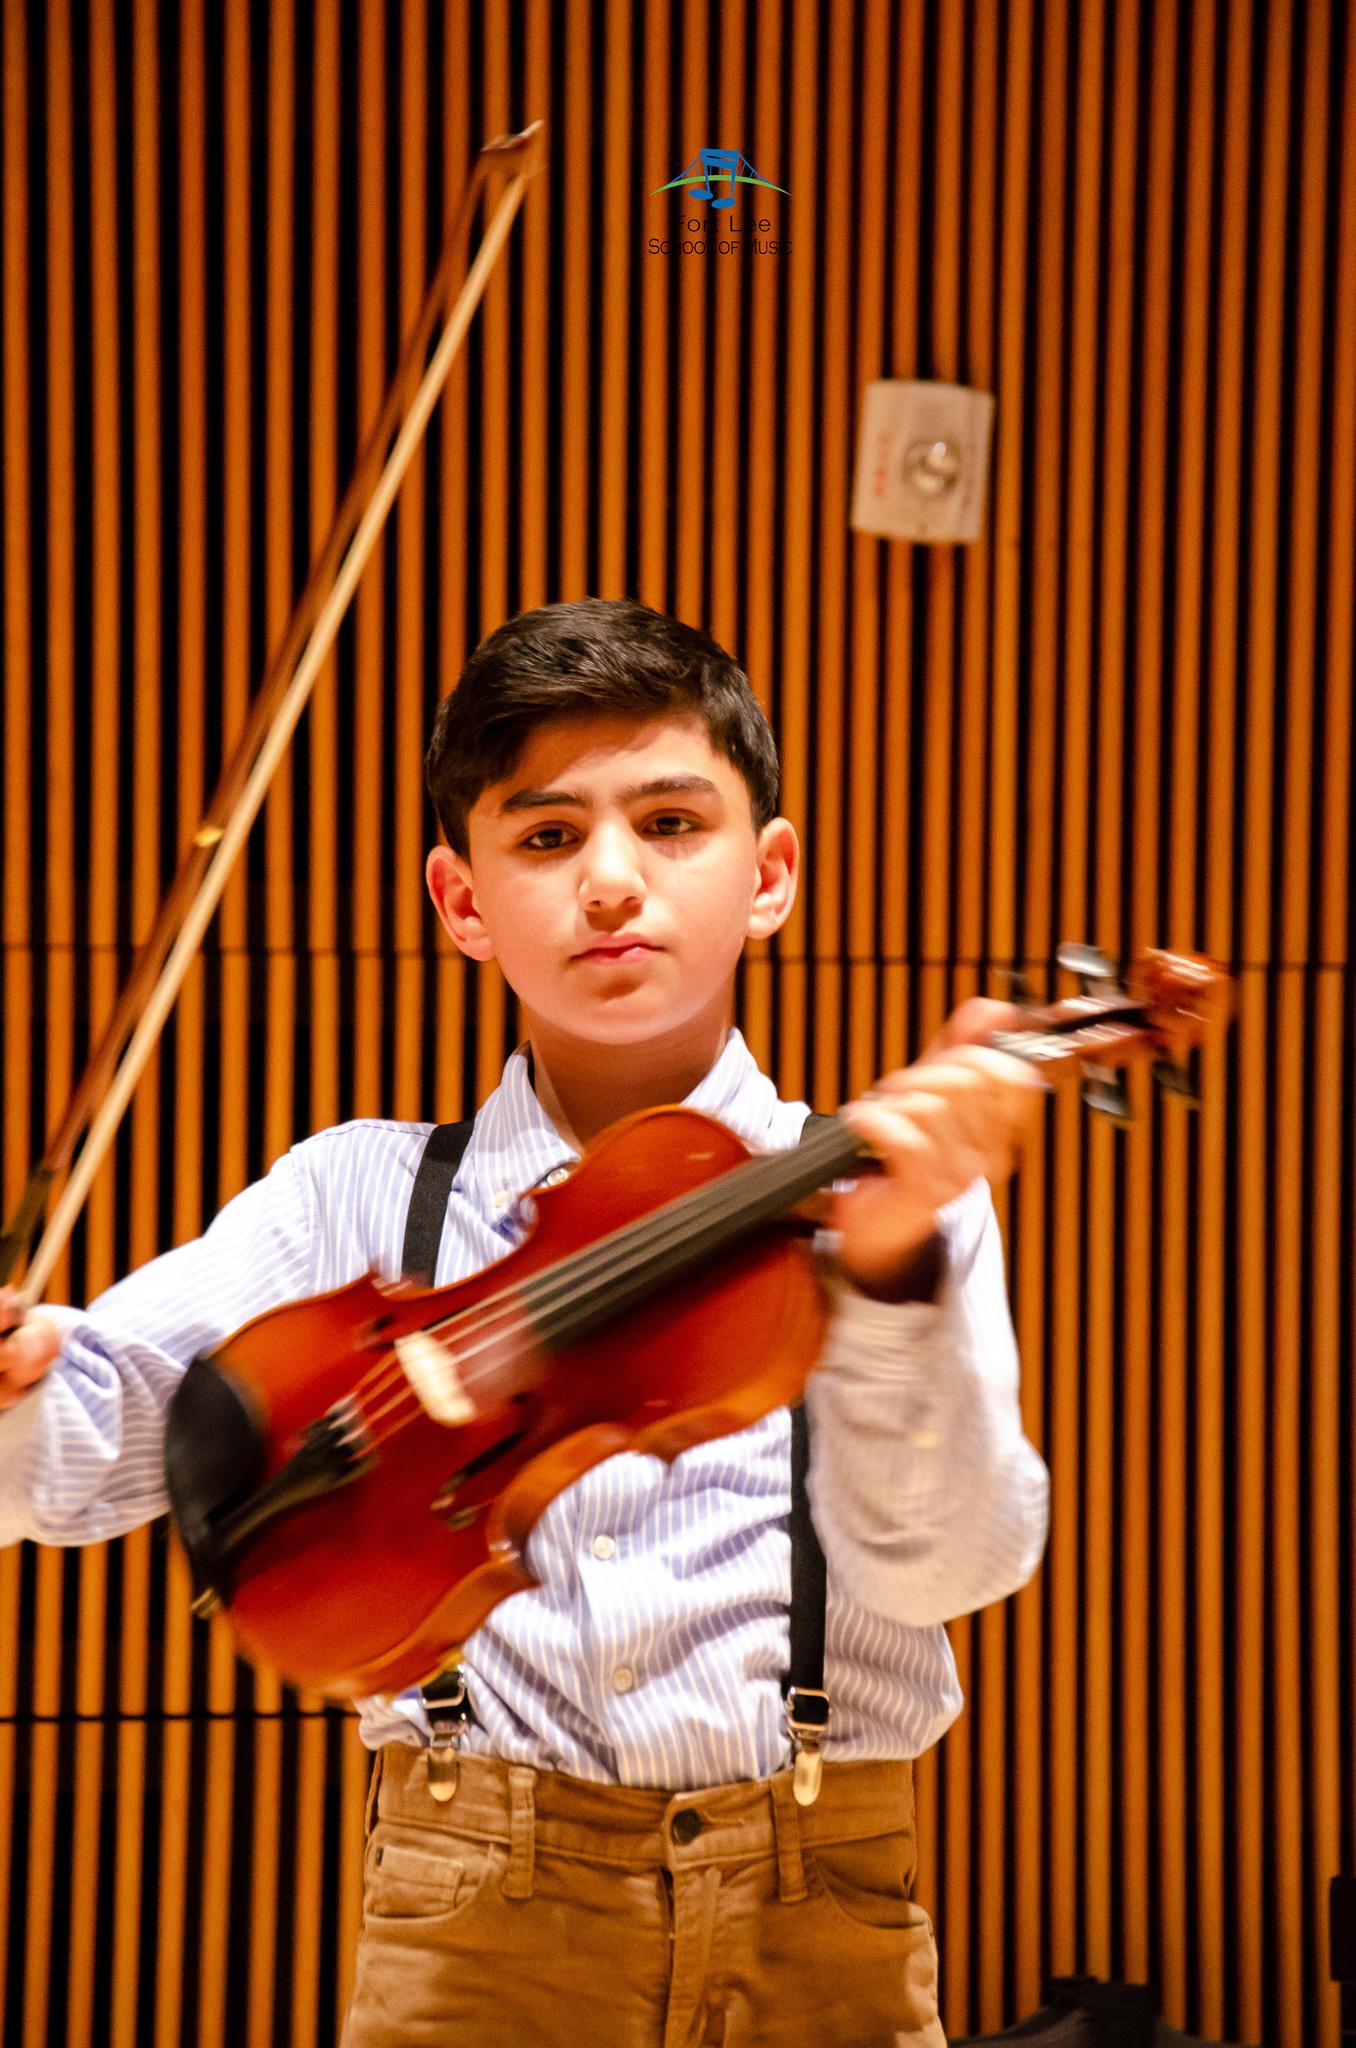 violin-lessons-englewood-cliffs.jpg